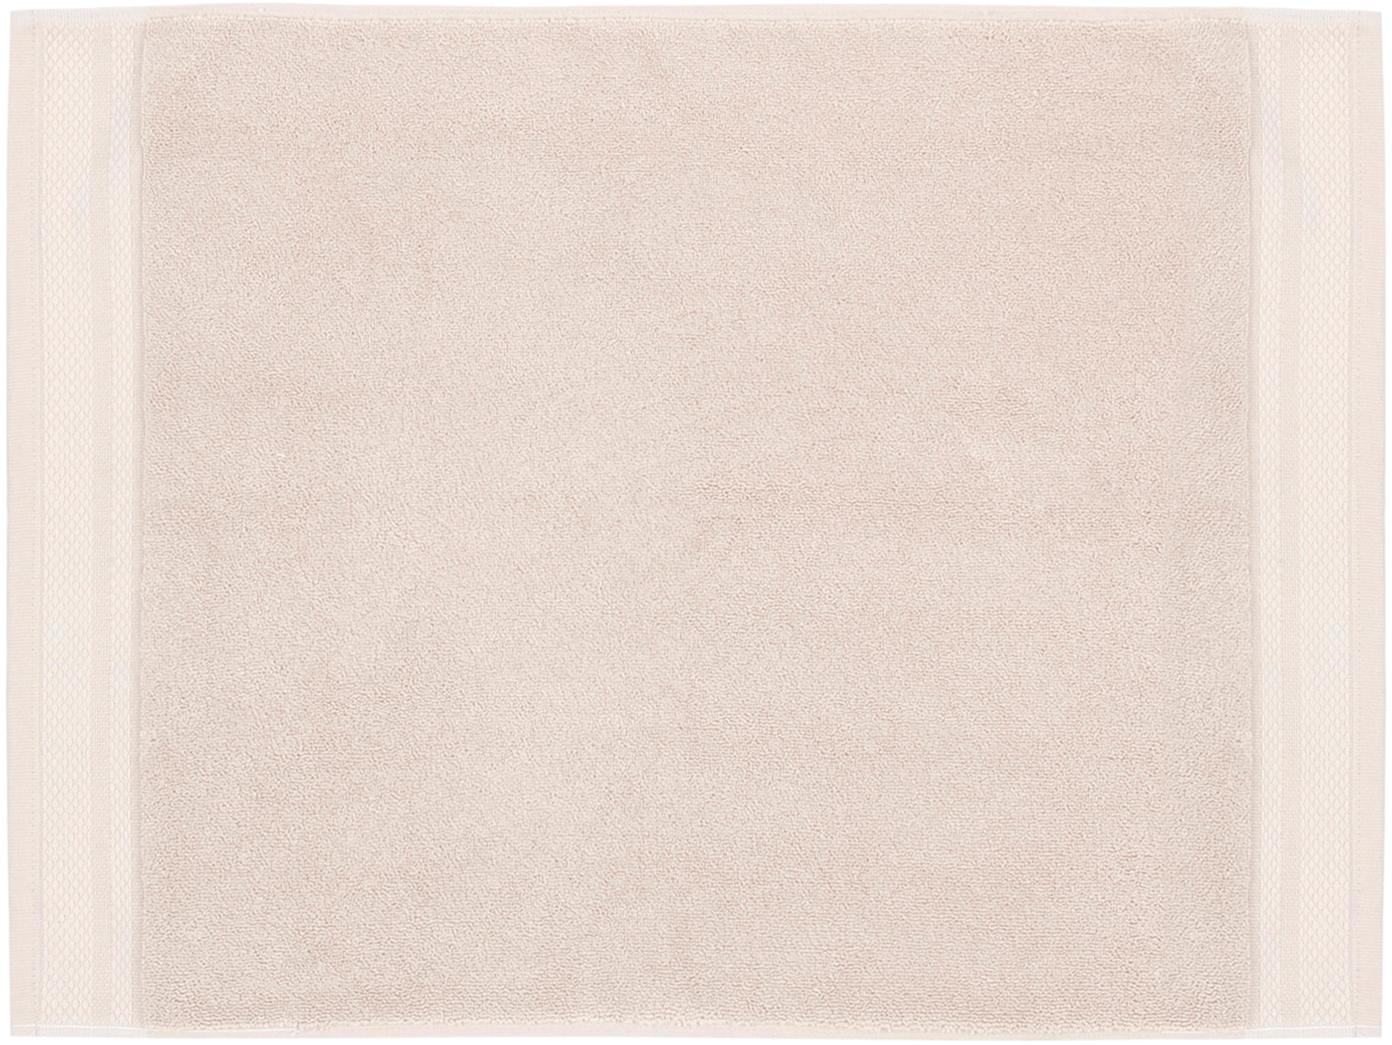 Alfombrilla de baño Premium, antideslizante, Beige, An 50 x L 70 cm